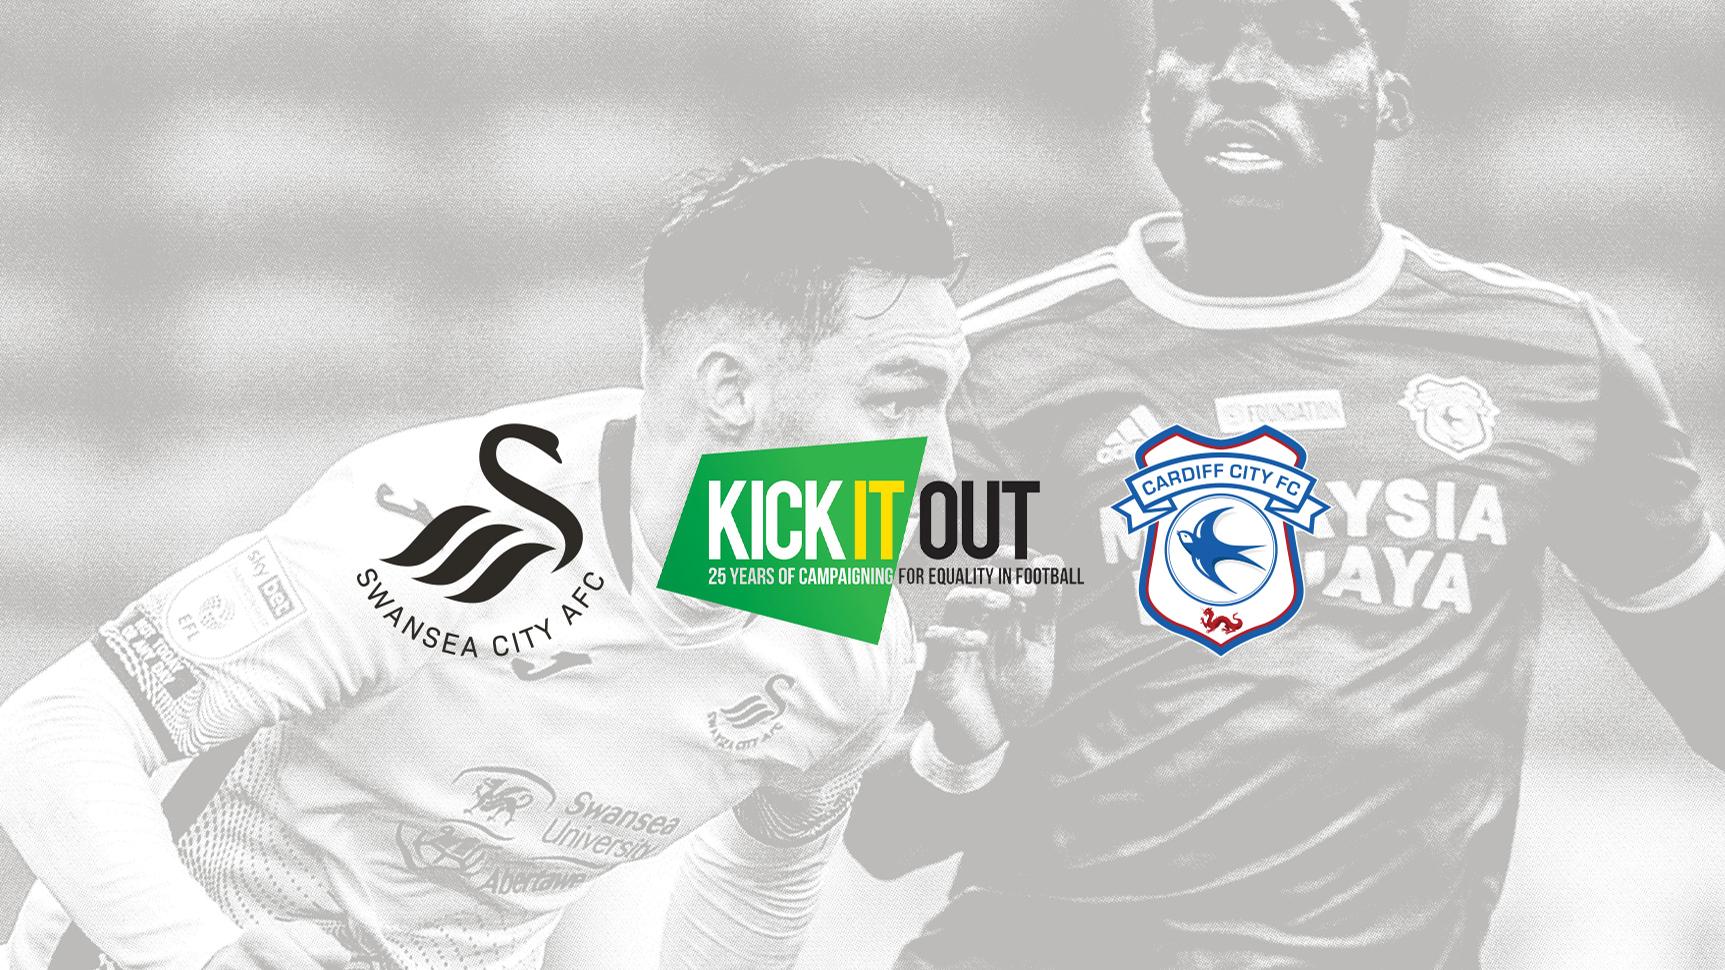 South Wales Derby Kick it Out